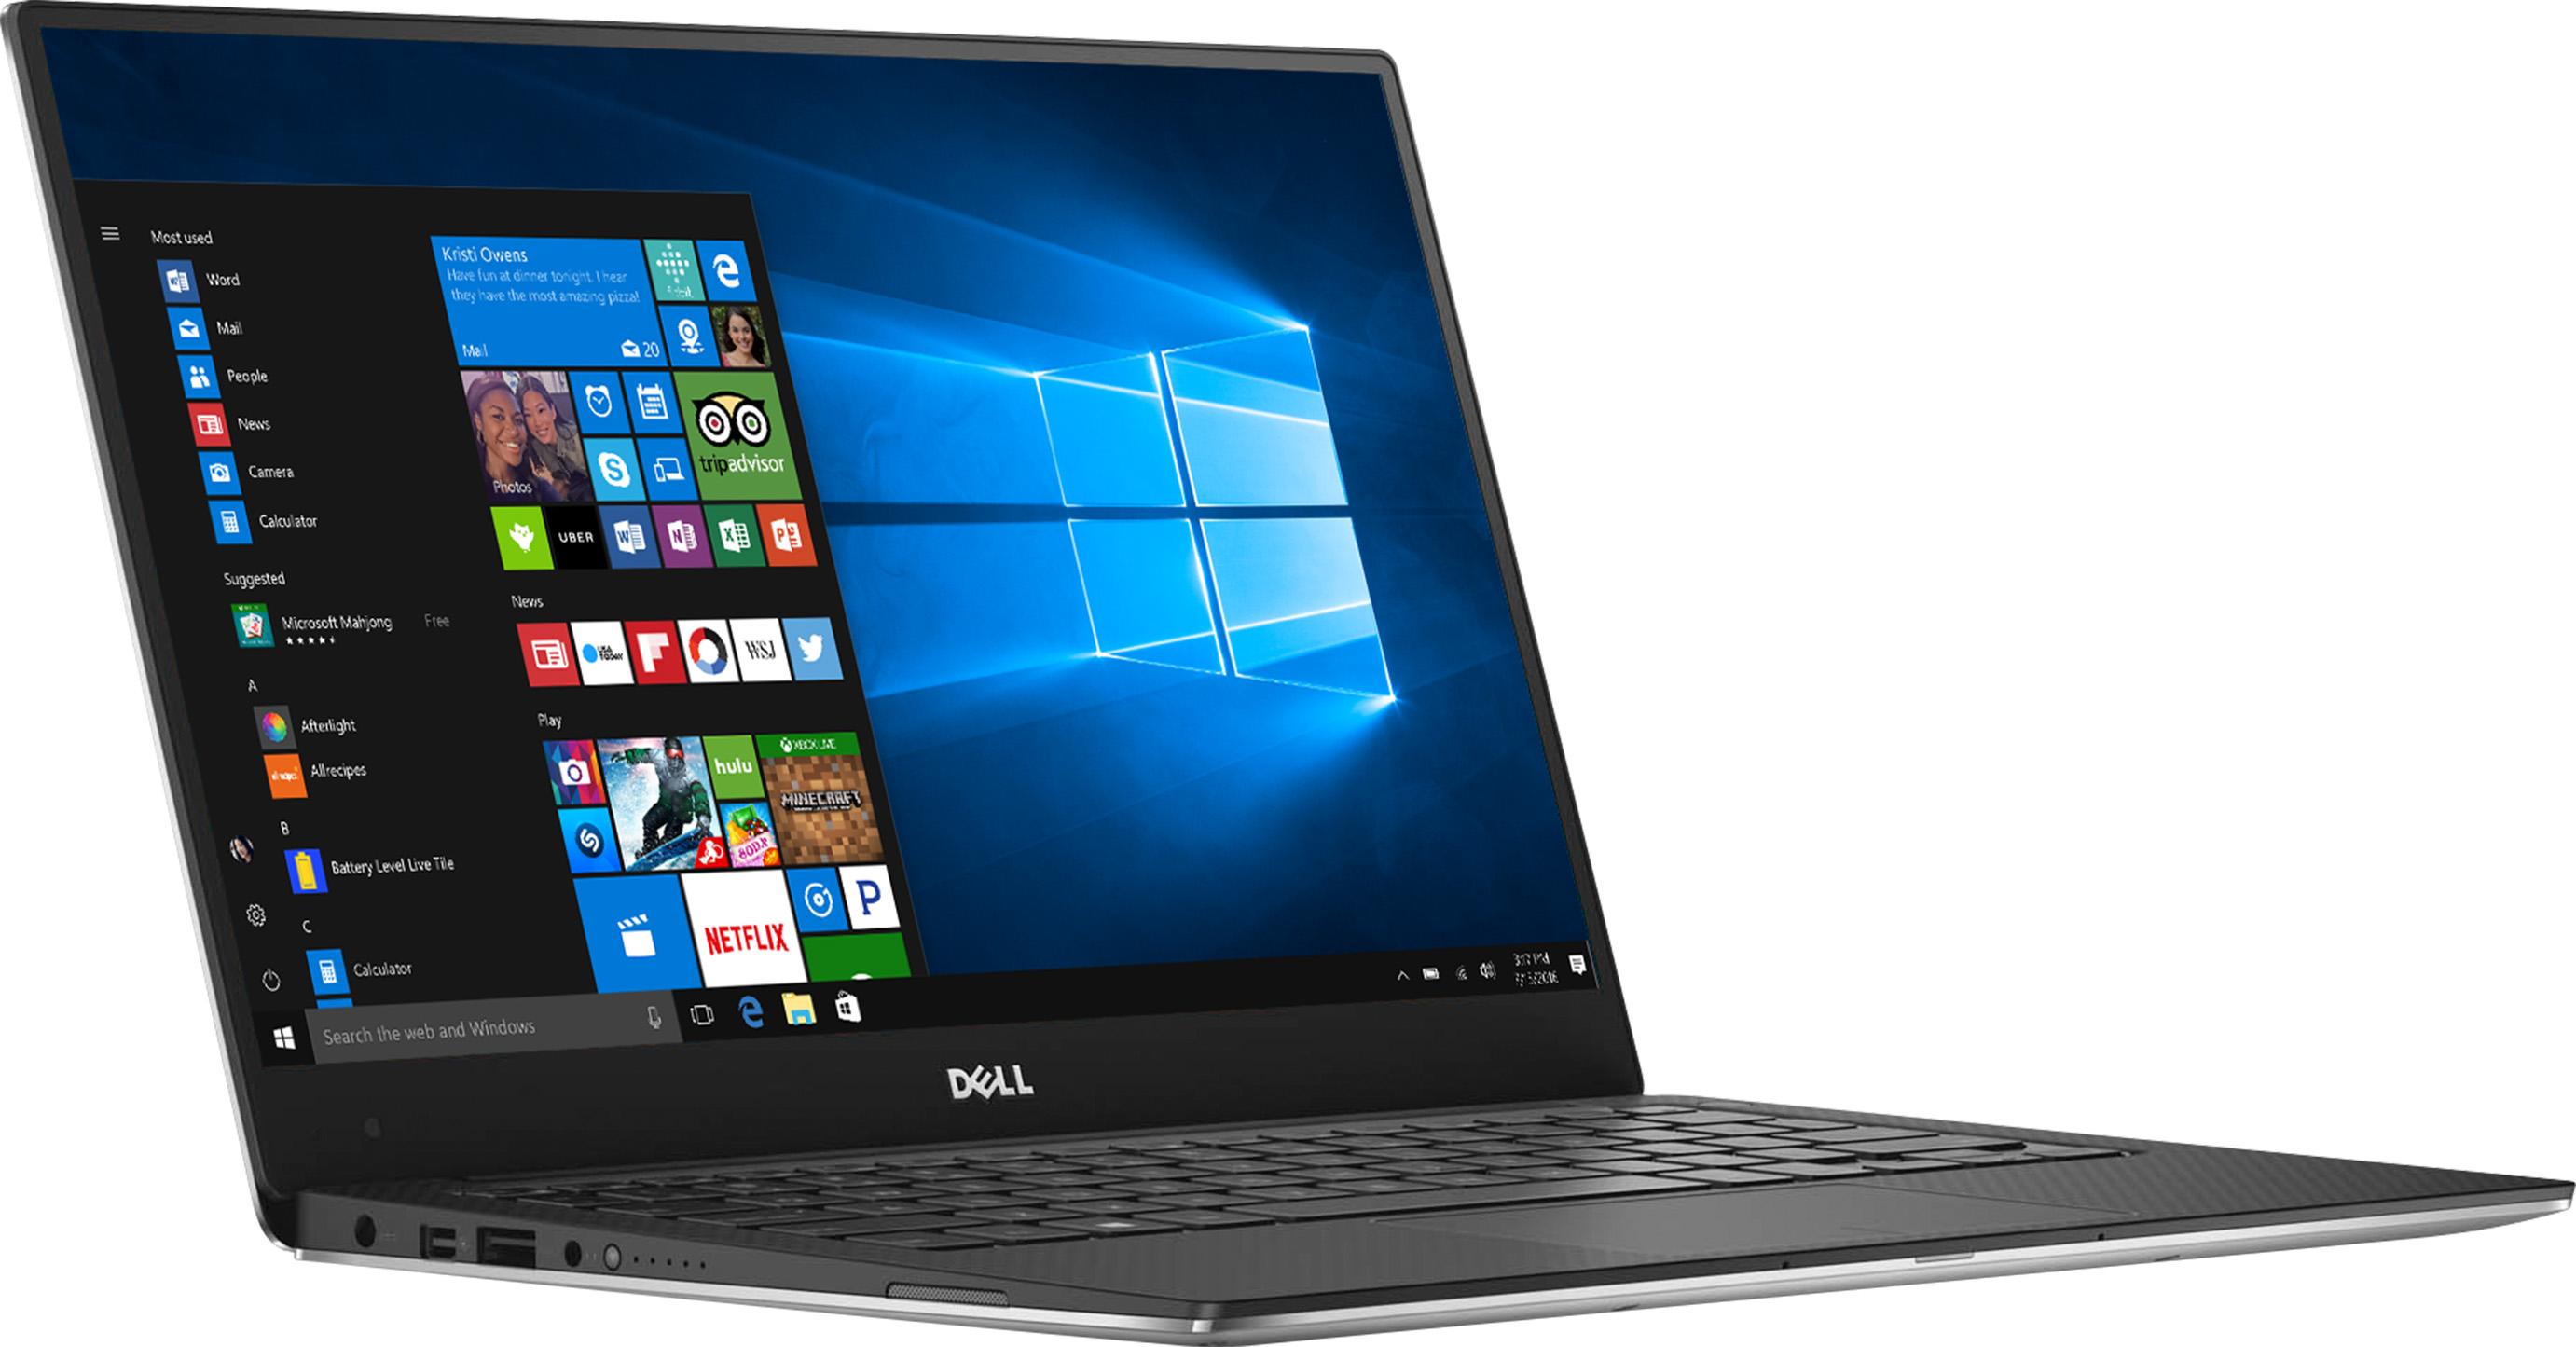 Dell XPS 15 9550 Signature Edition Laptop